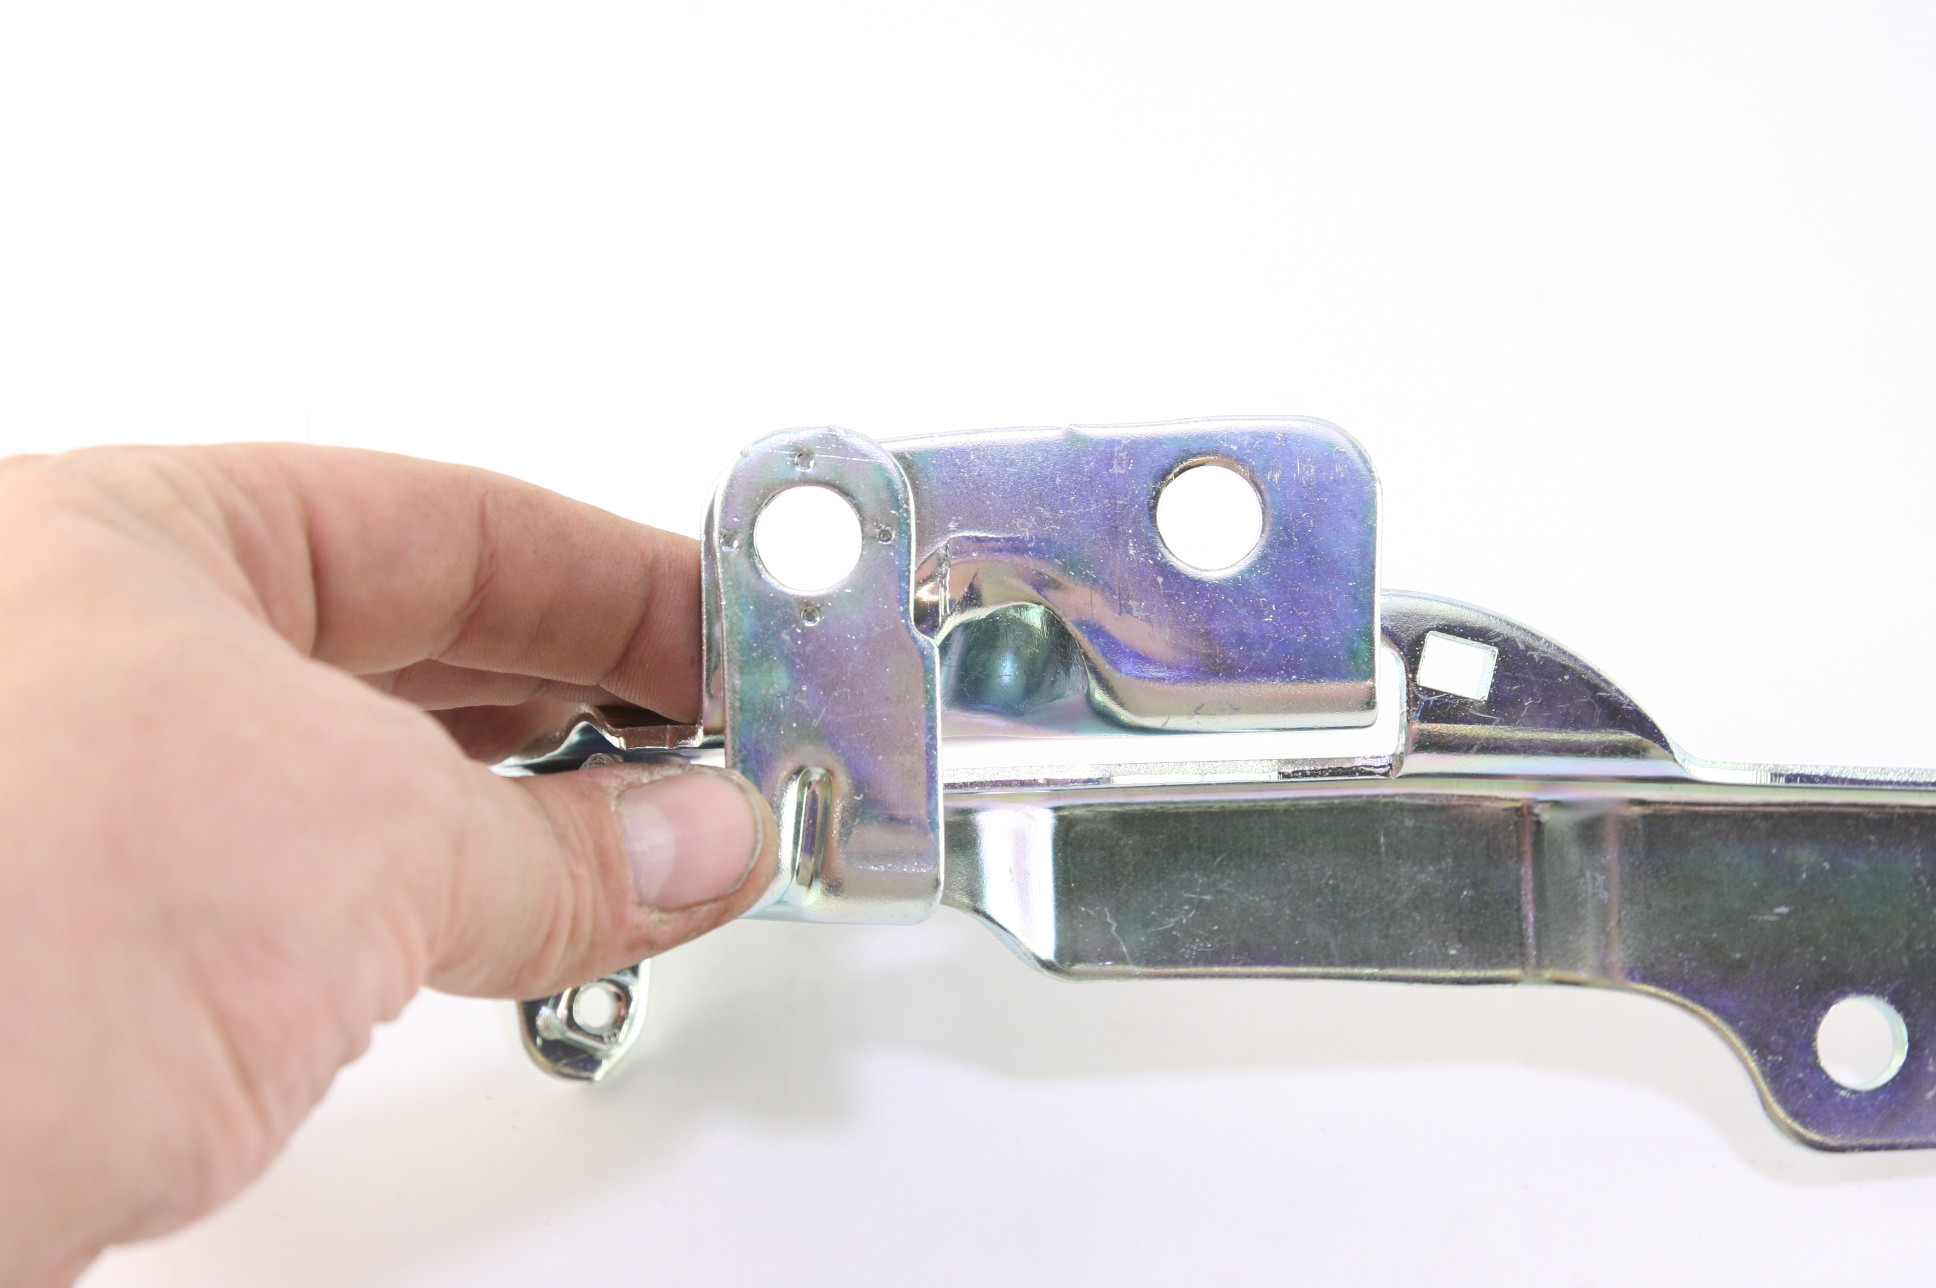 ** New Genuine KIA OEM 791203E000 Right Hood Hinge 2003-2009 Sorento NIP - image 6